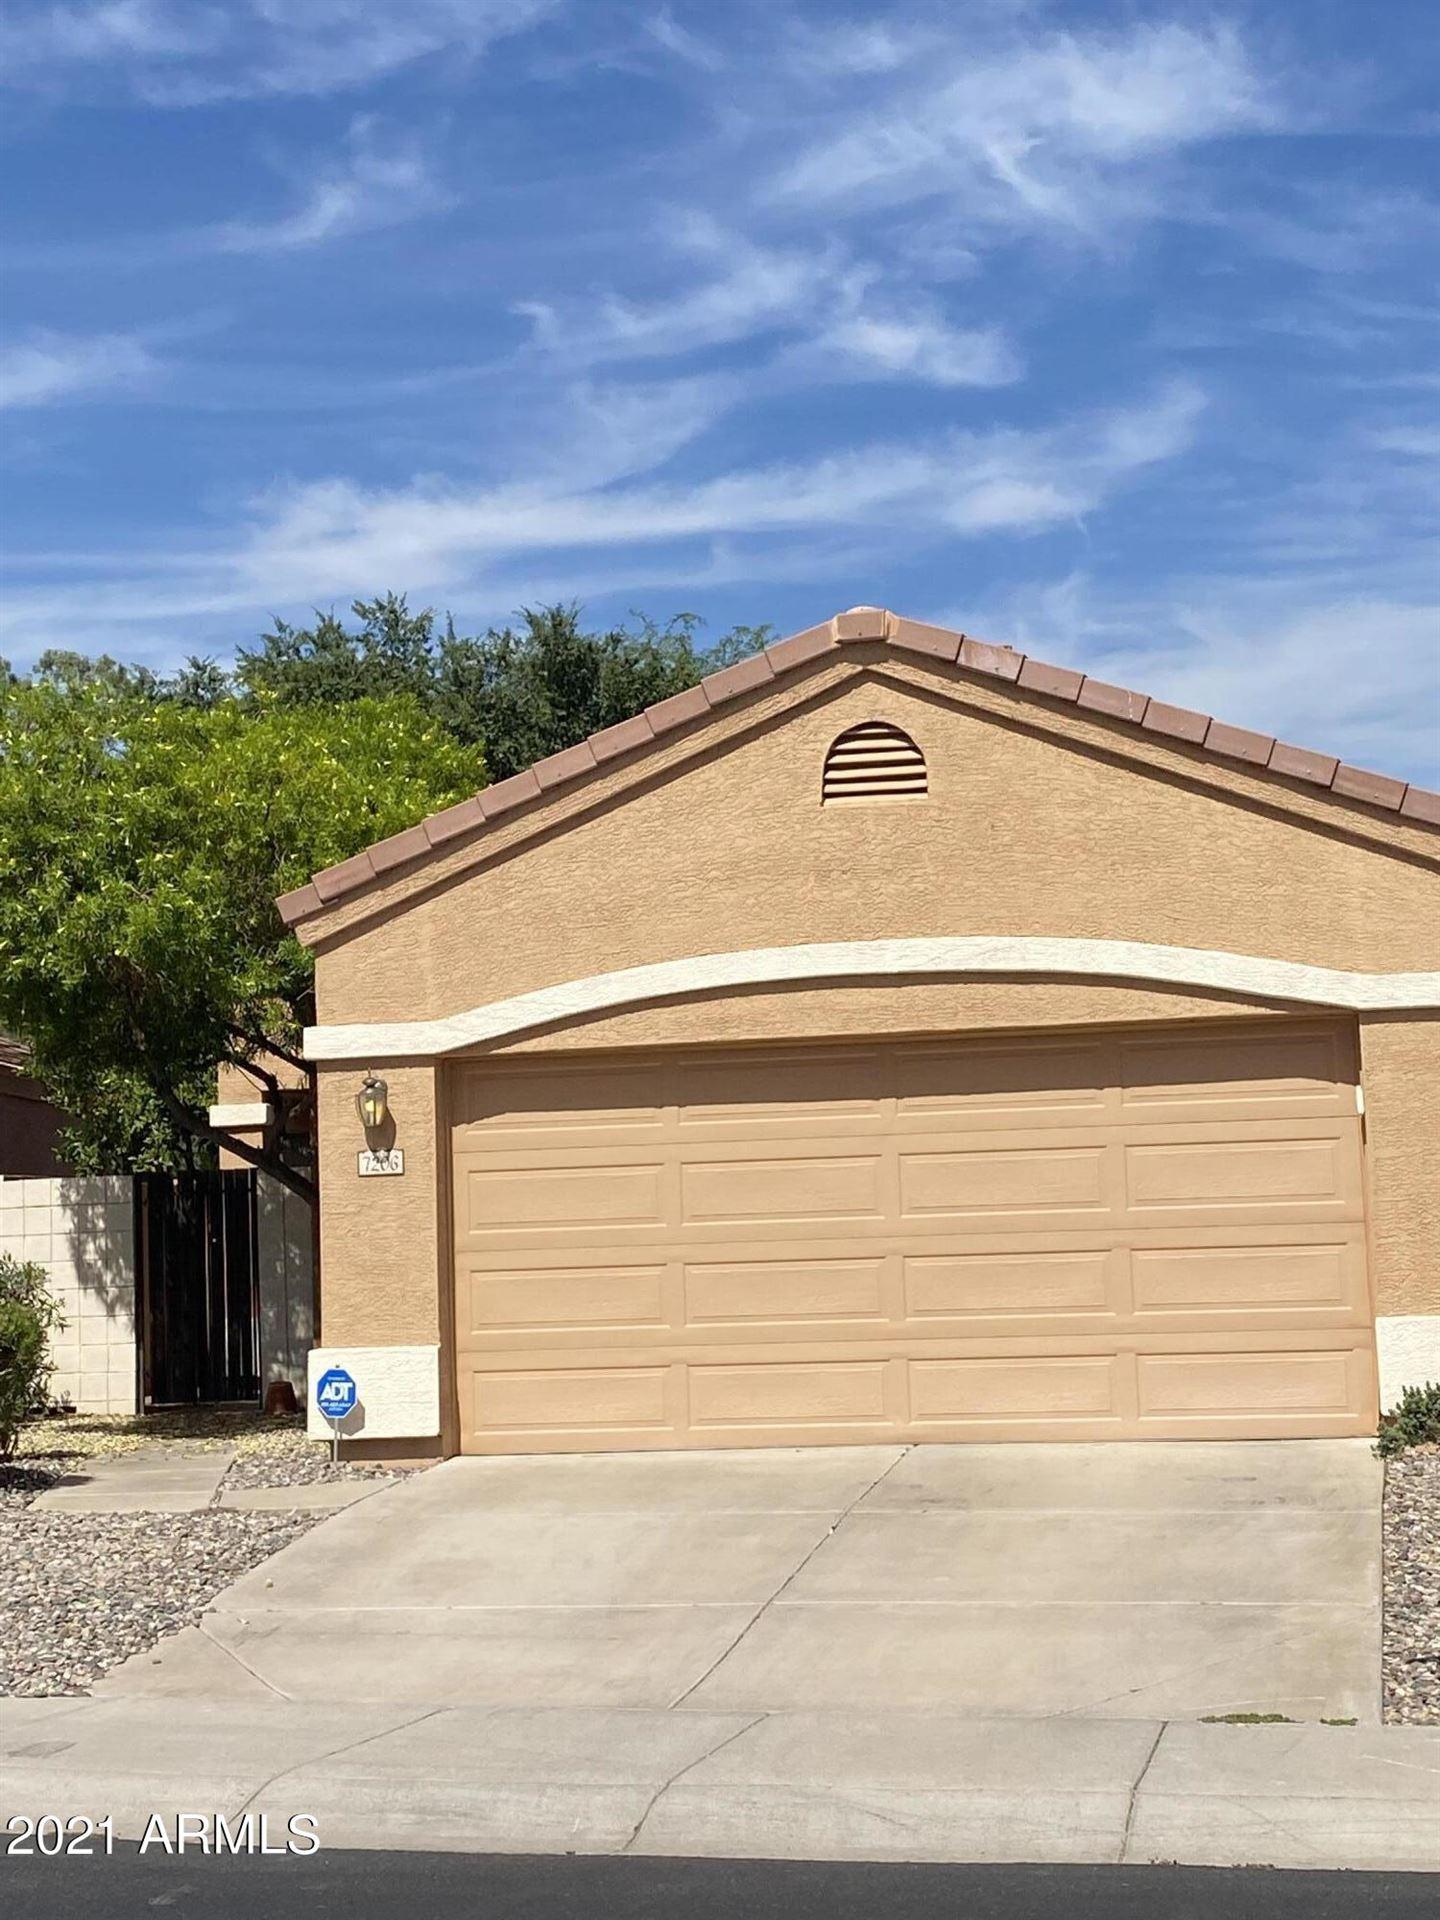 7206 S 32nd Place, Phoenix, AZ 85042 - MLS#: 6249189